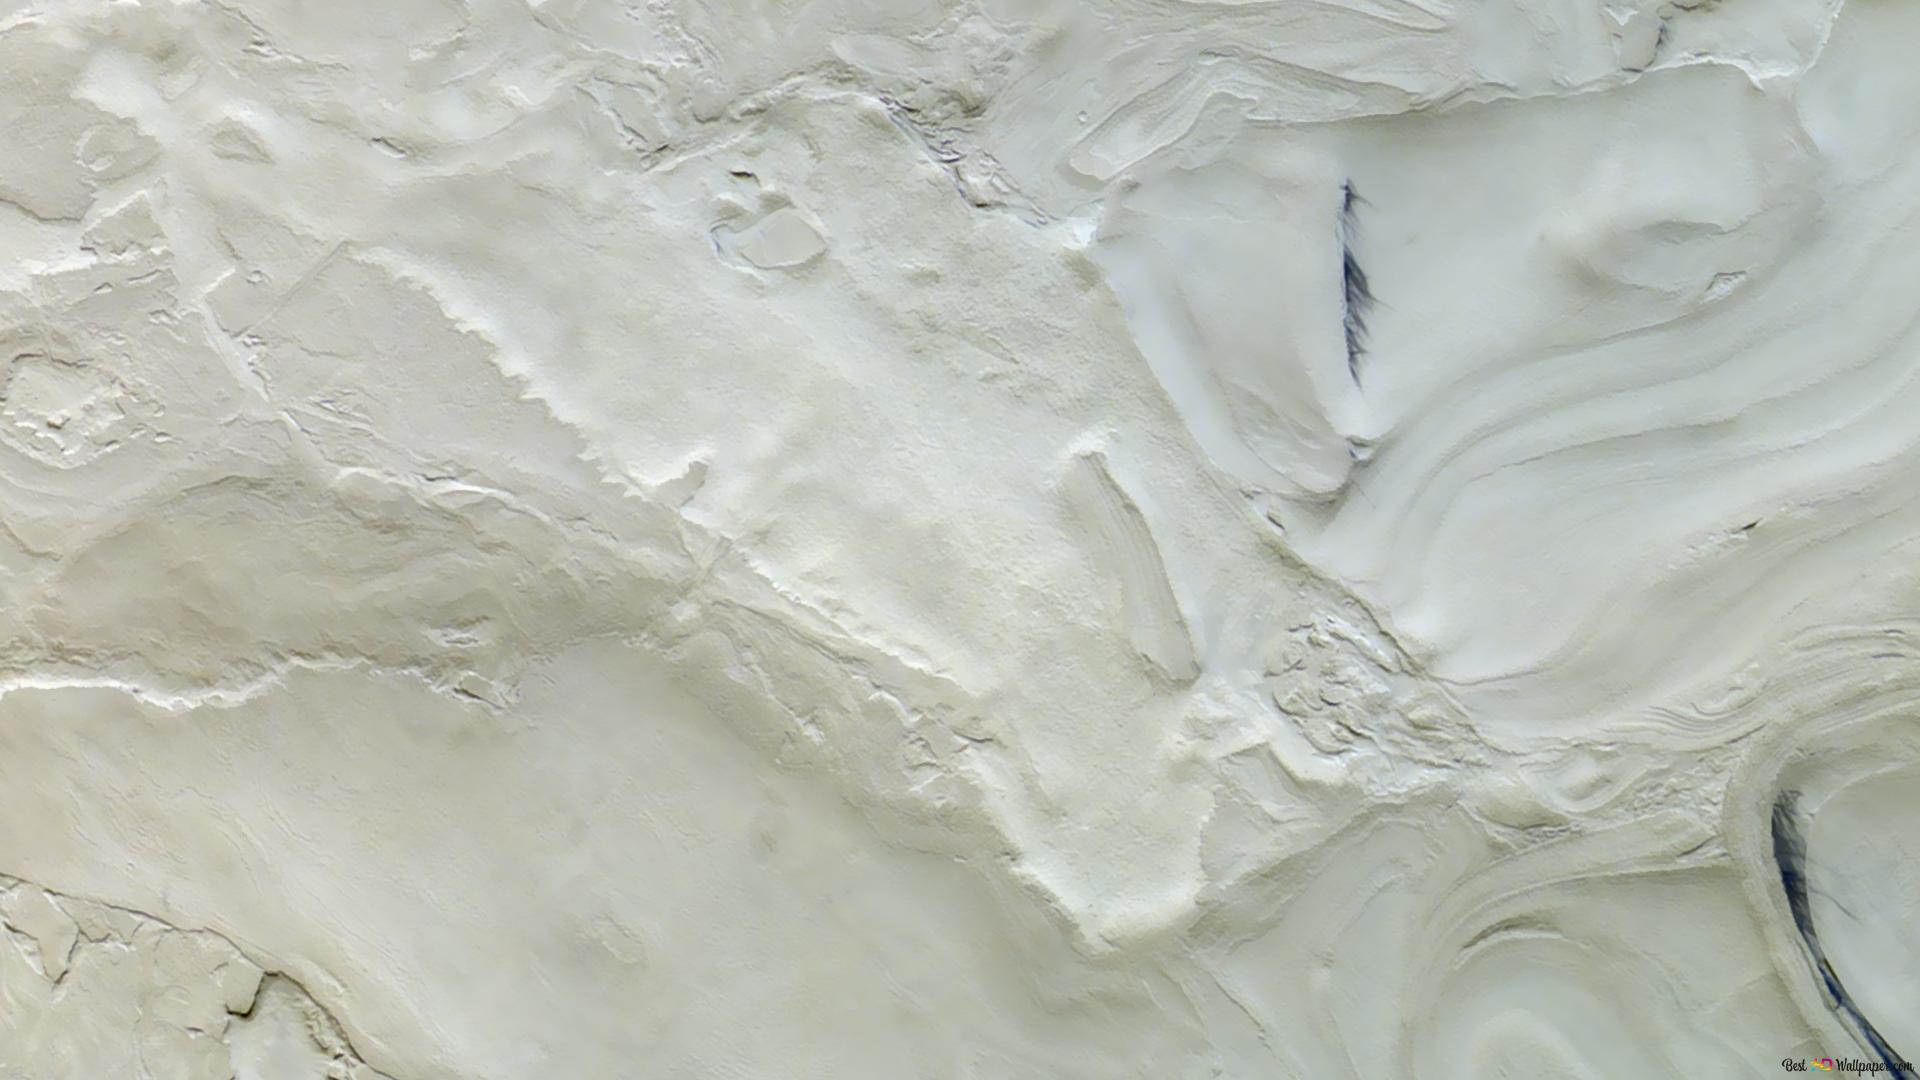 Mars Banded Terrain By Nasa Hd Wallpaper Download